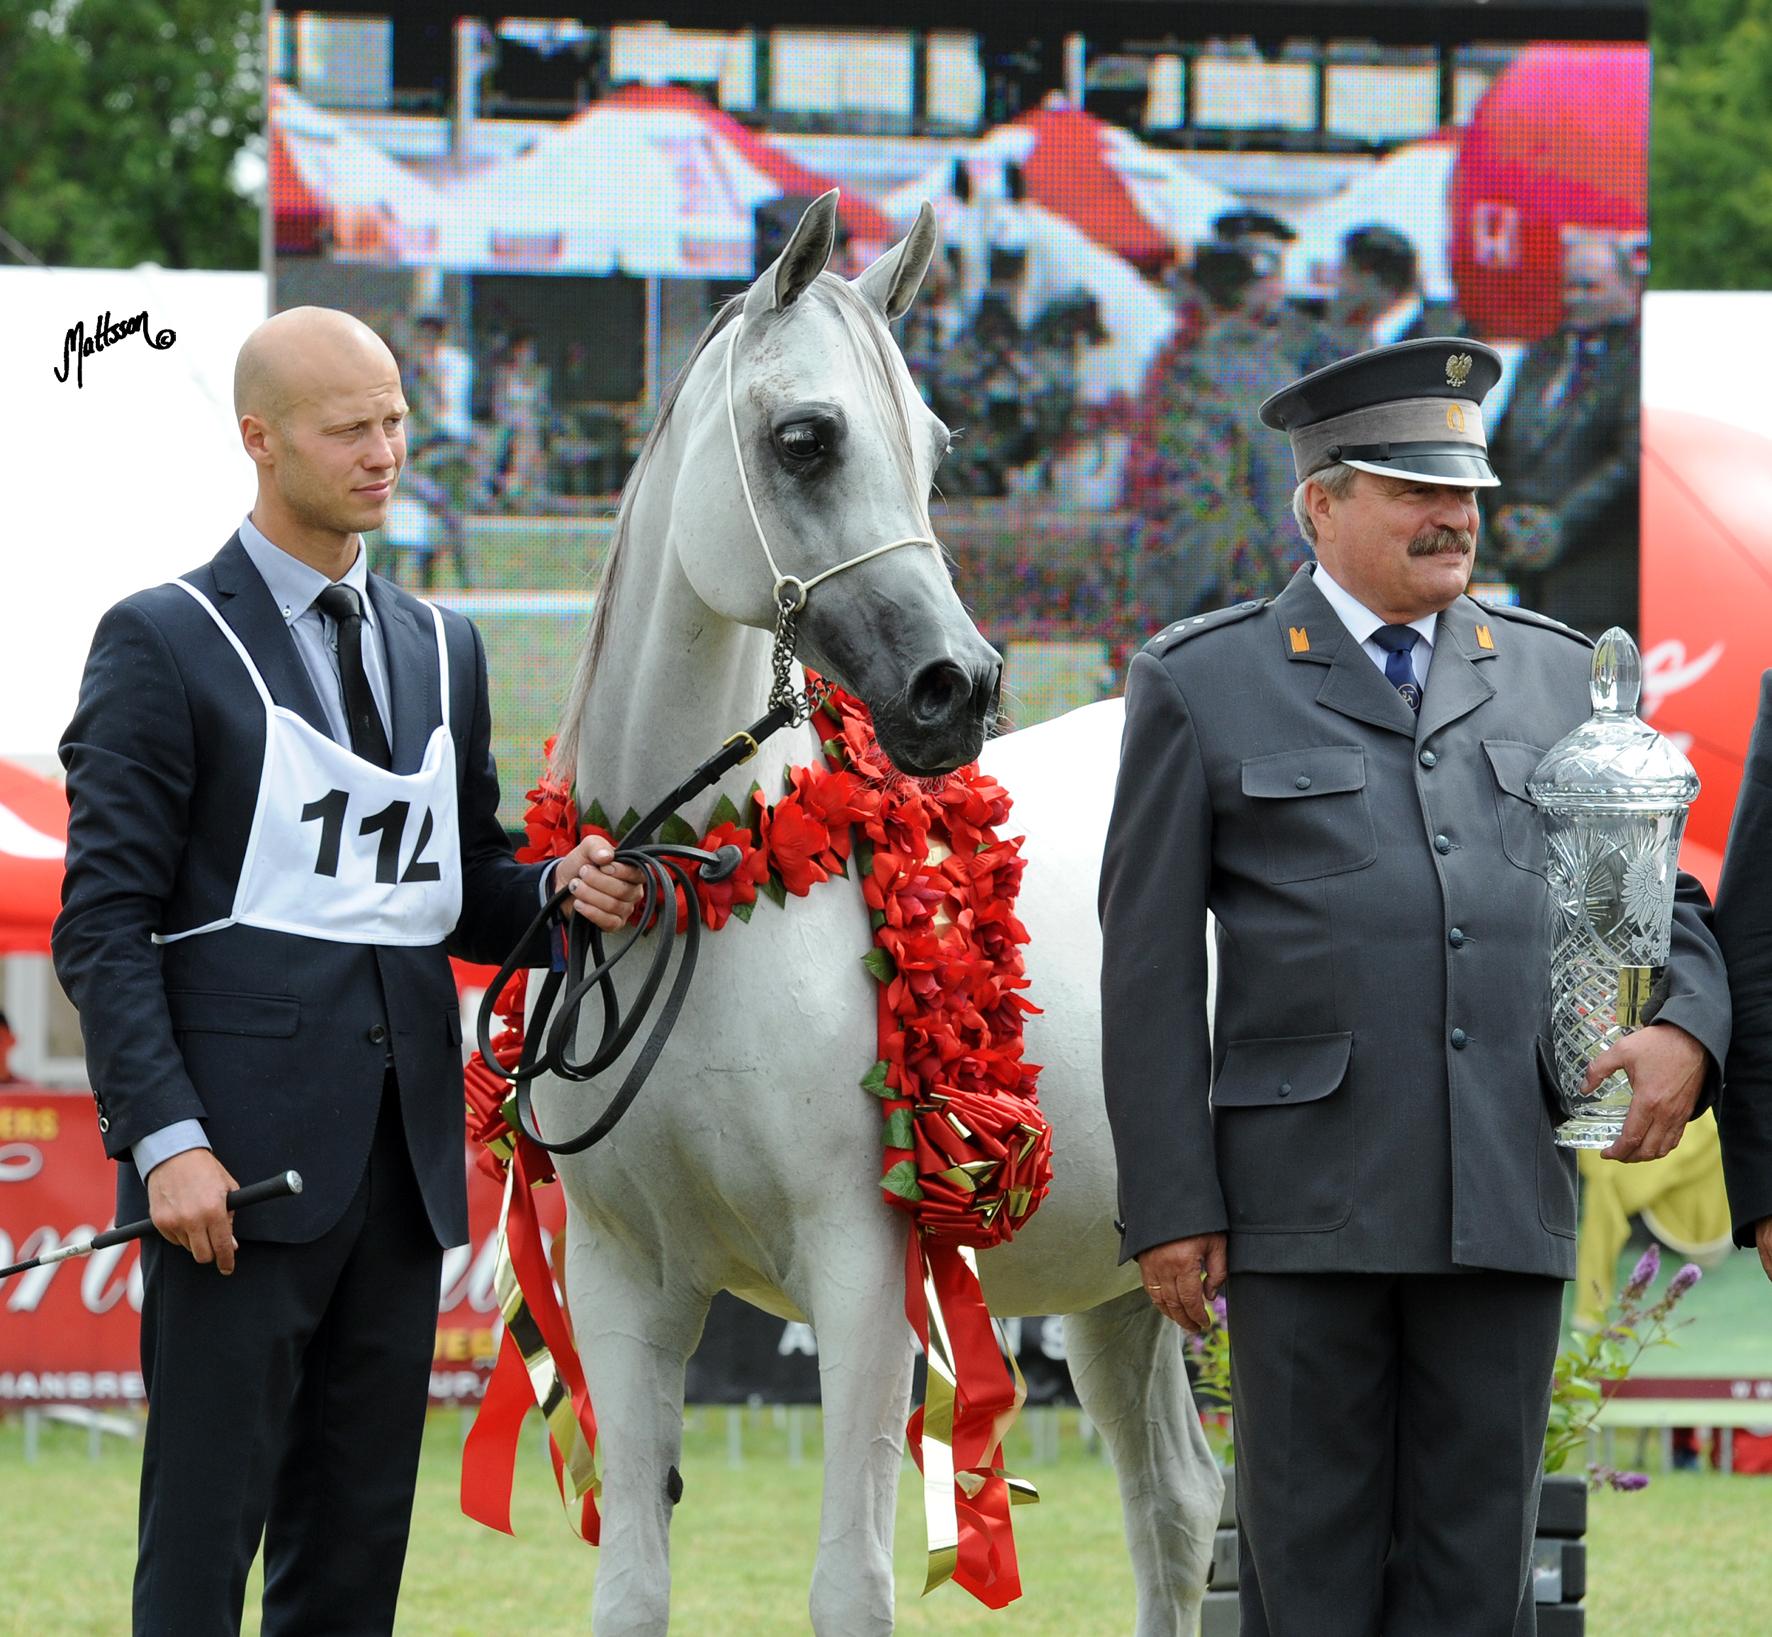 Palmeta - 2012 Polish National Champion Mare and Best in Show with Pawel Kozikowski and Director Marek Trela